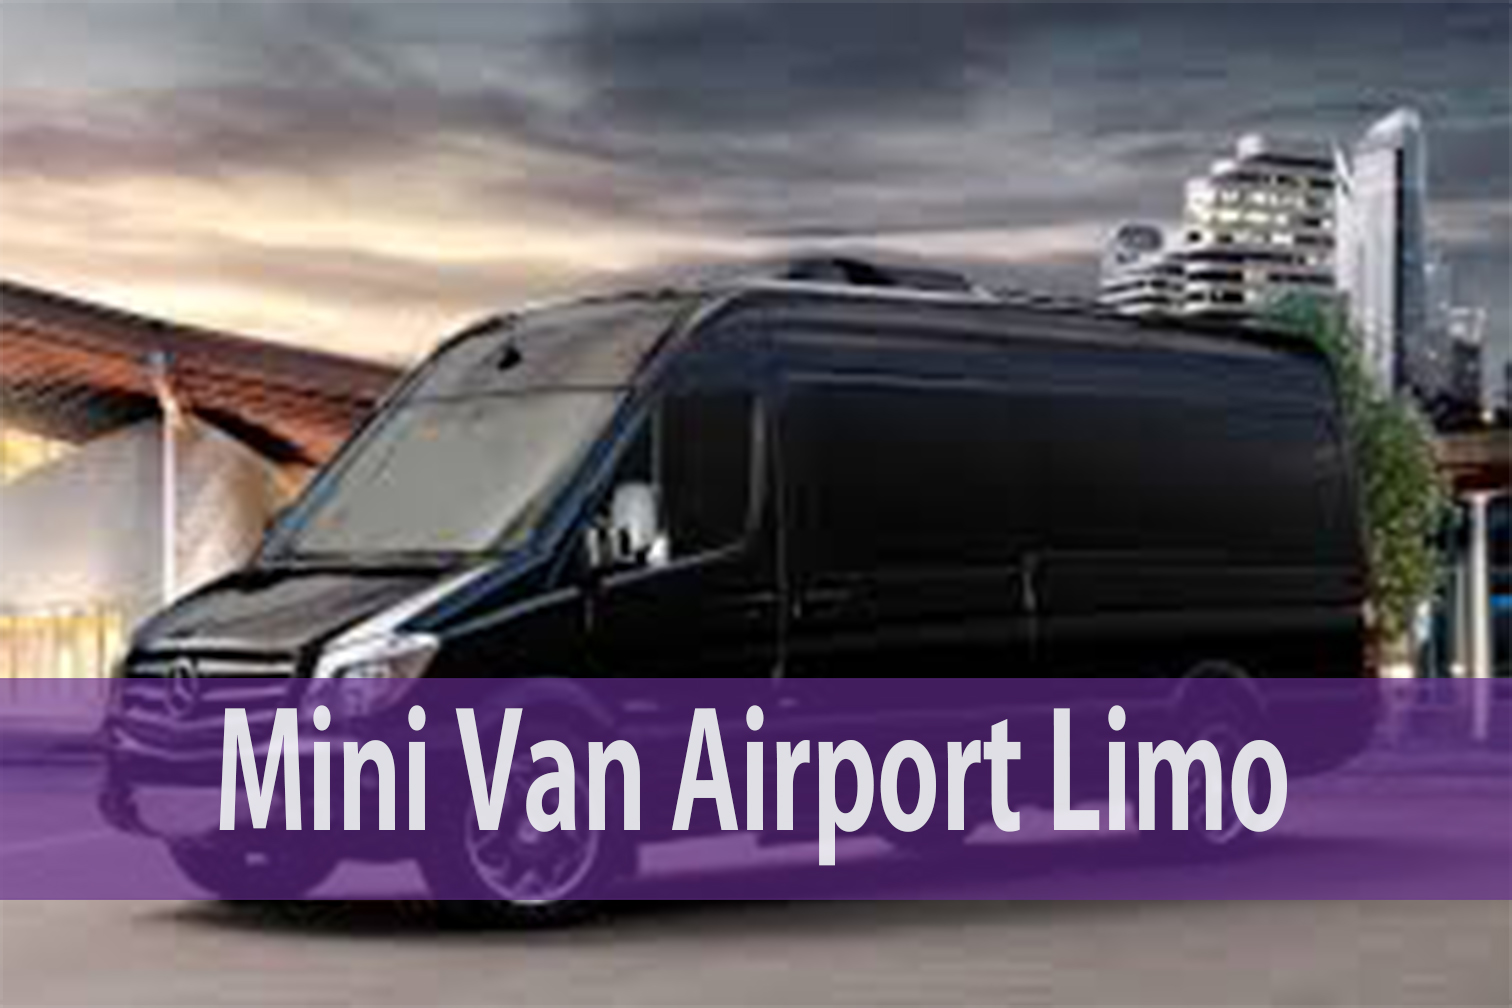 Mini Van Airport Limo